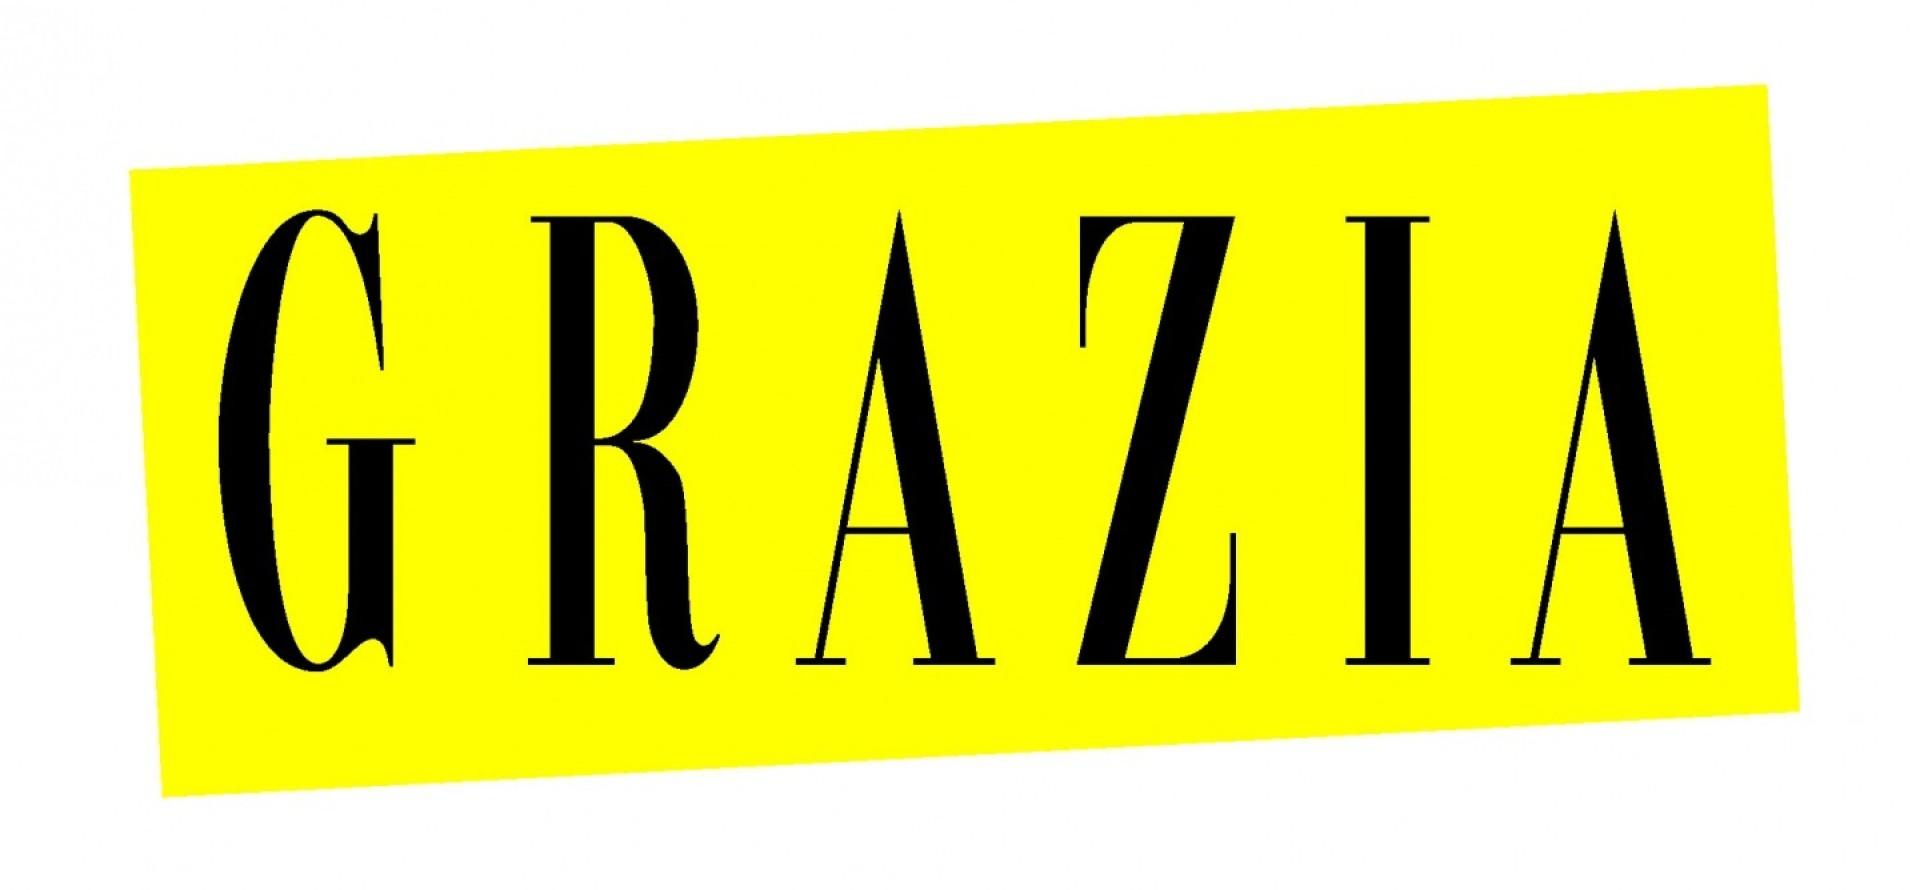 grazia-yb-grazia-magazine-logo-680745779-1920x890.jpg